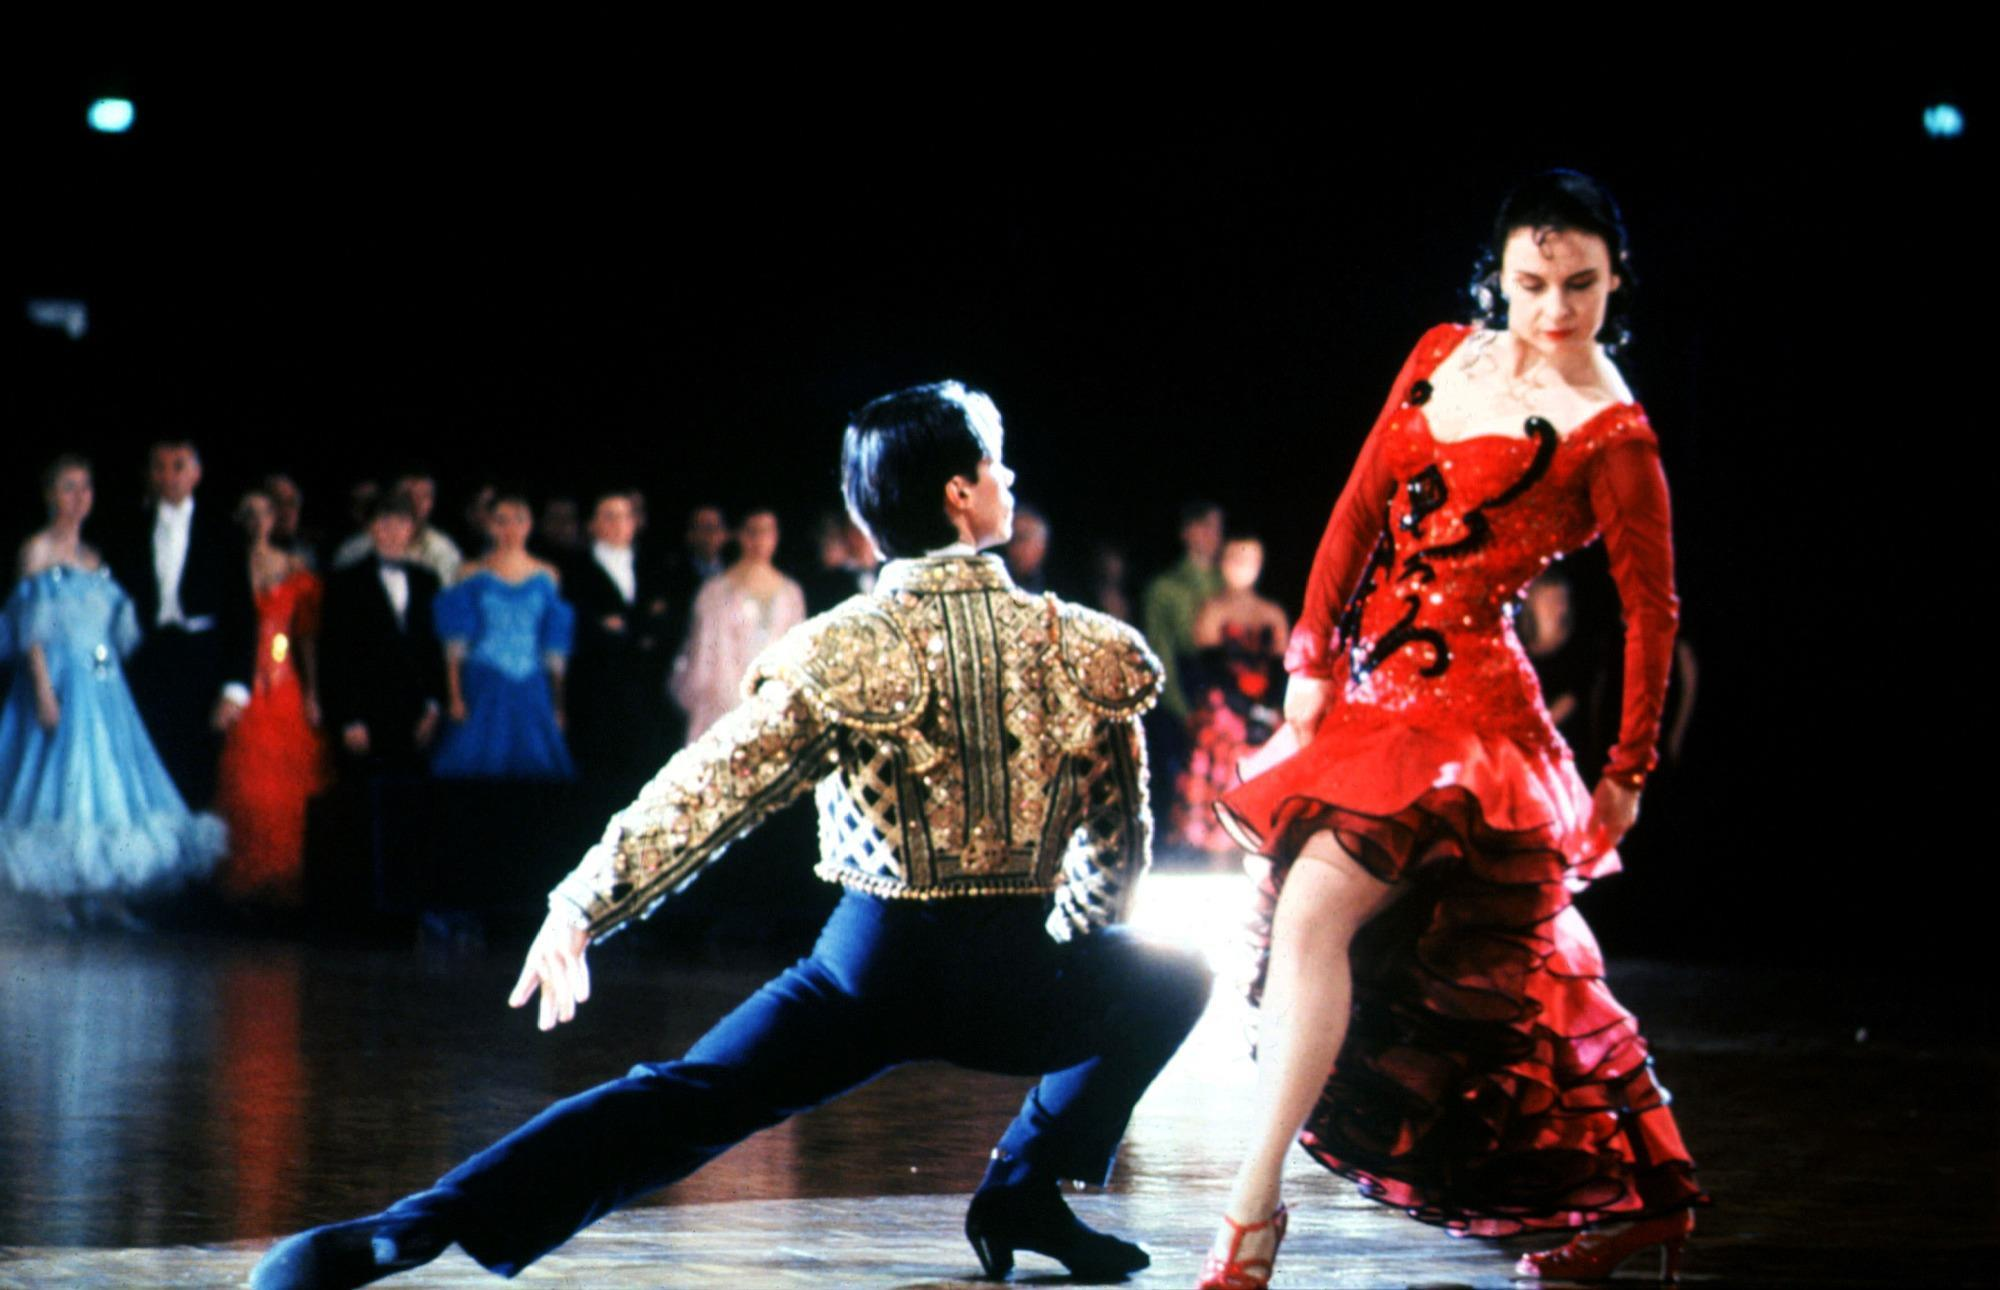 strictly ballroom 3 essay